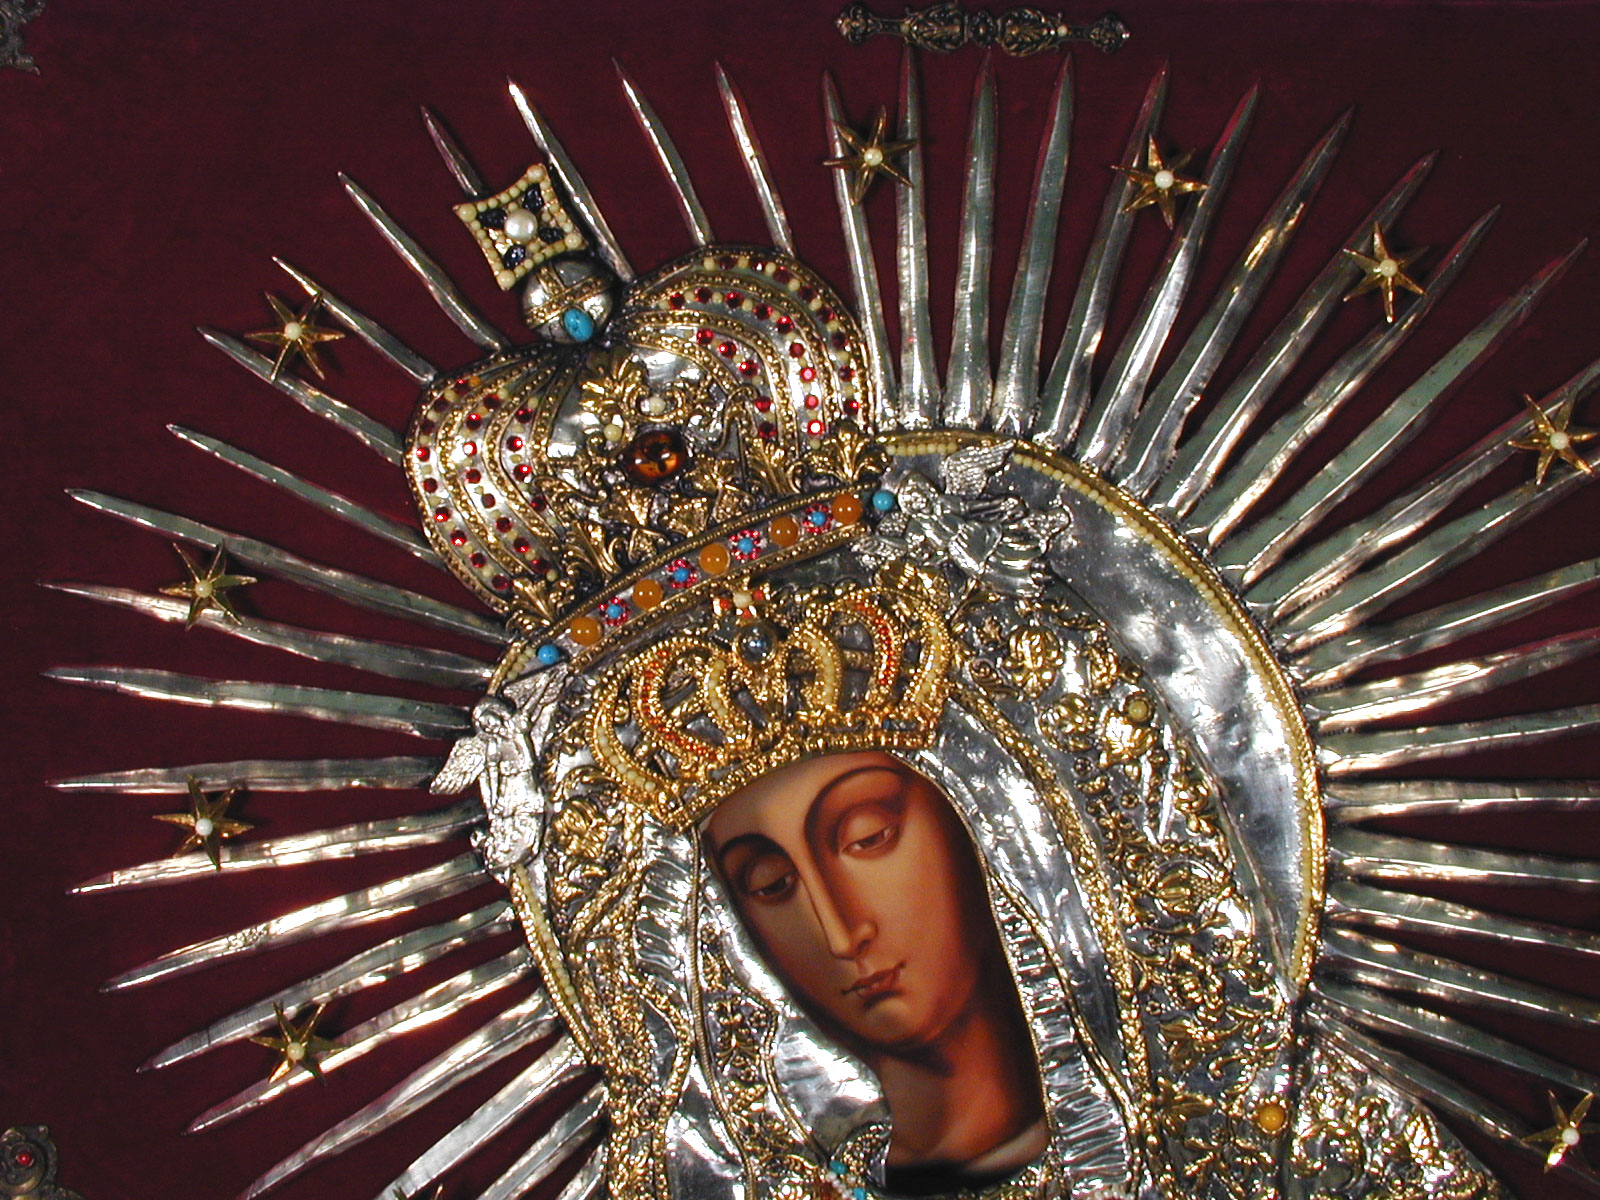 Madre de la Misericordia, donde nació el Jesús de la Misericordia, Lituania (16 nov, 25 mar)